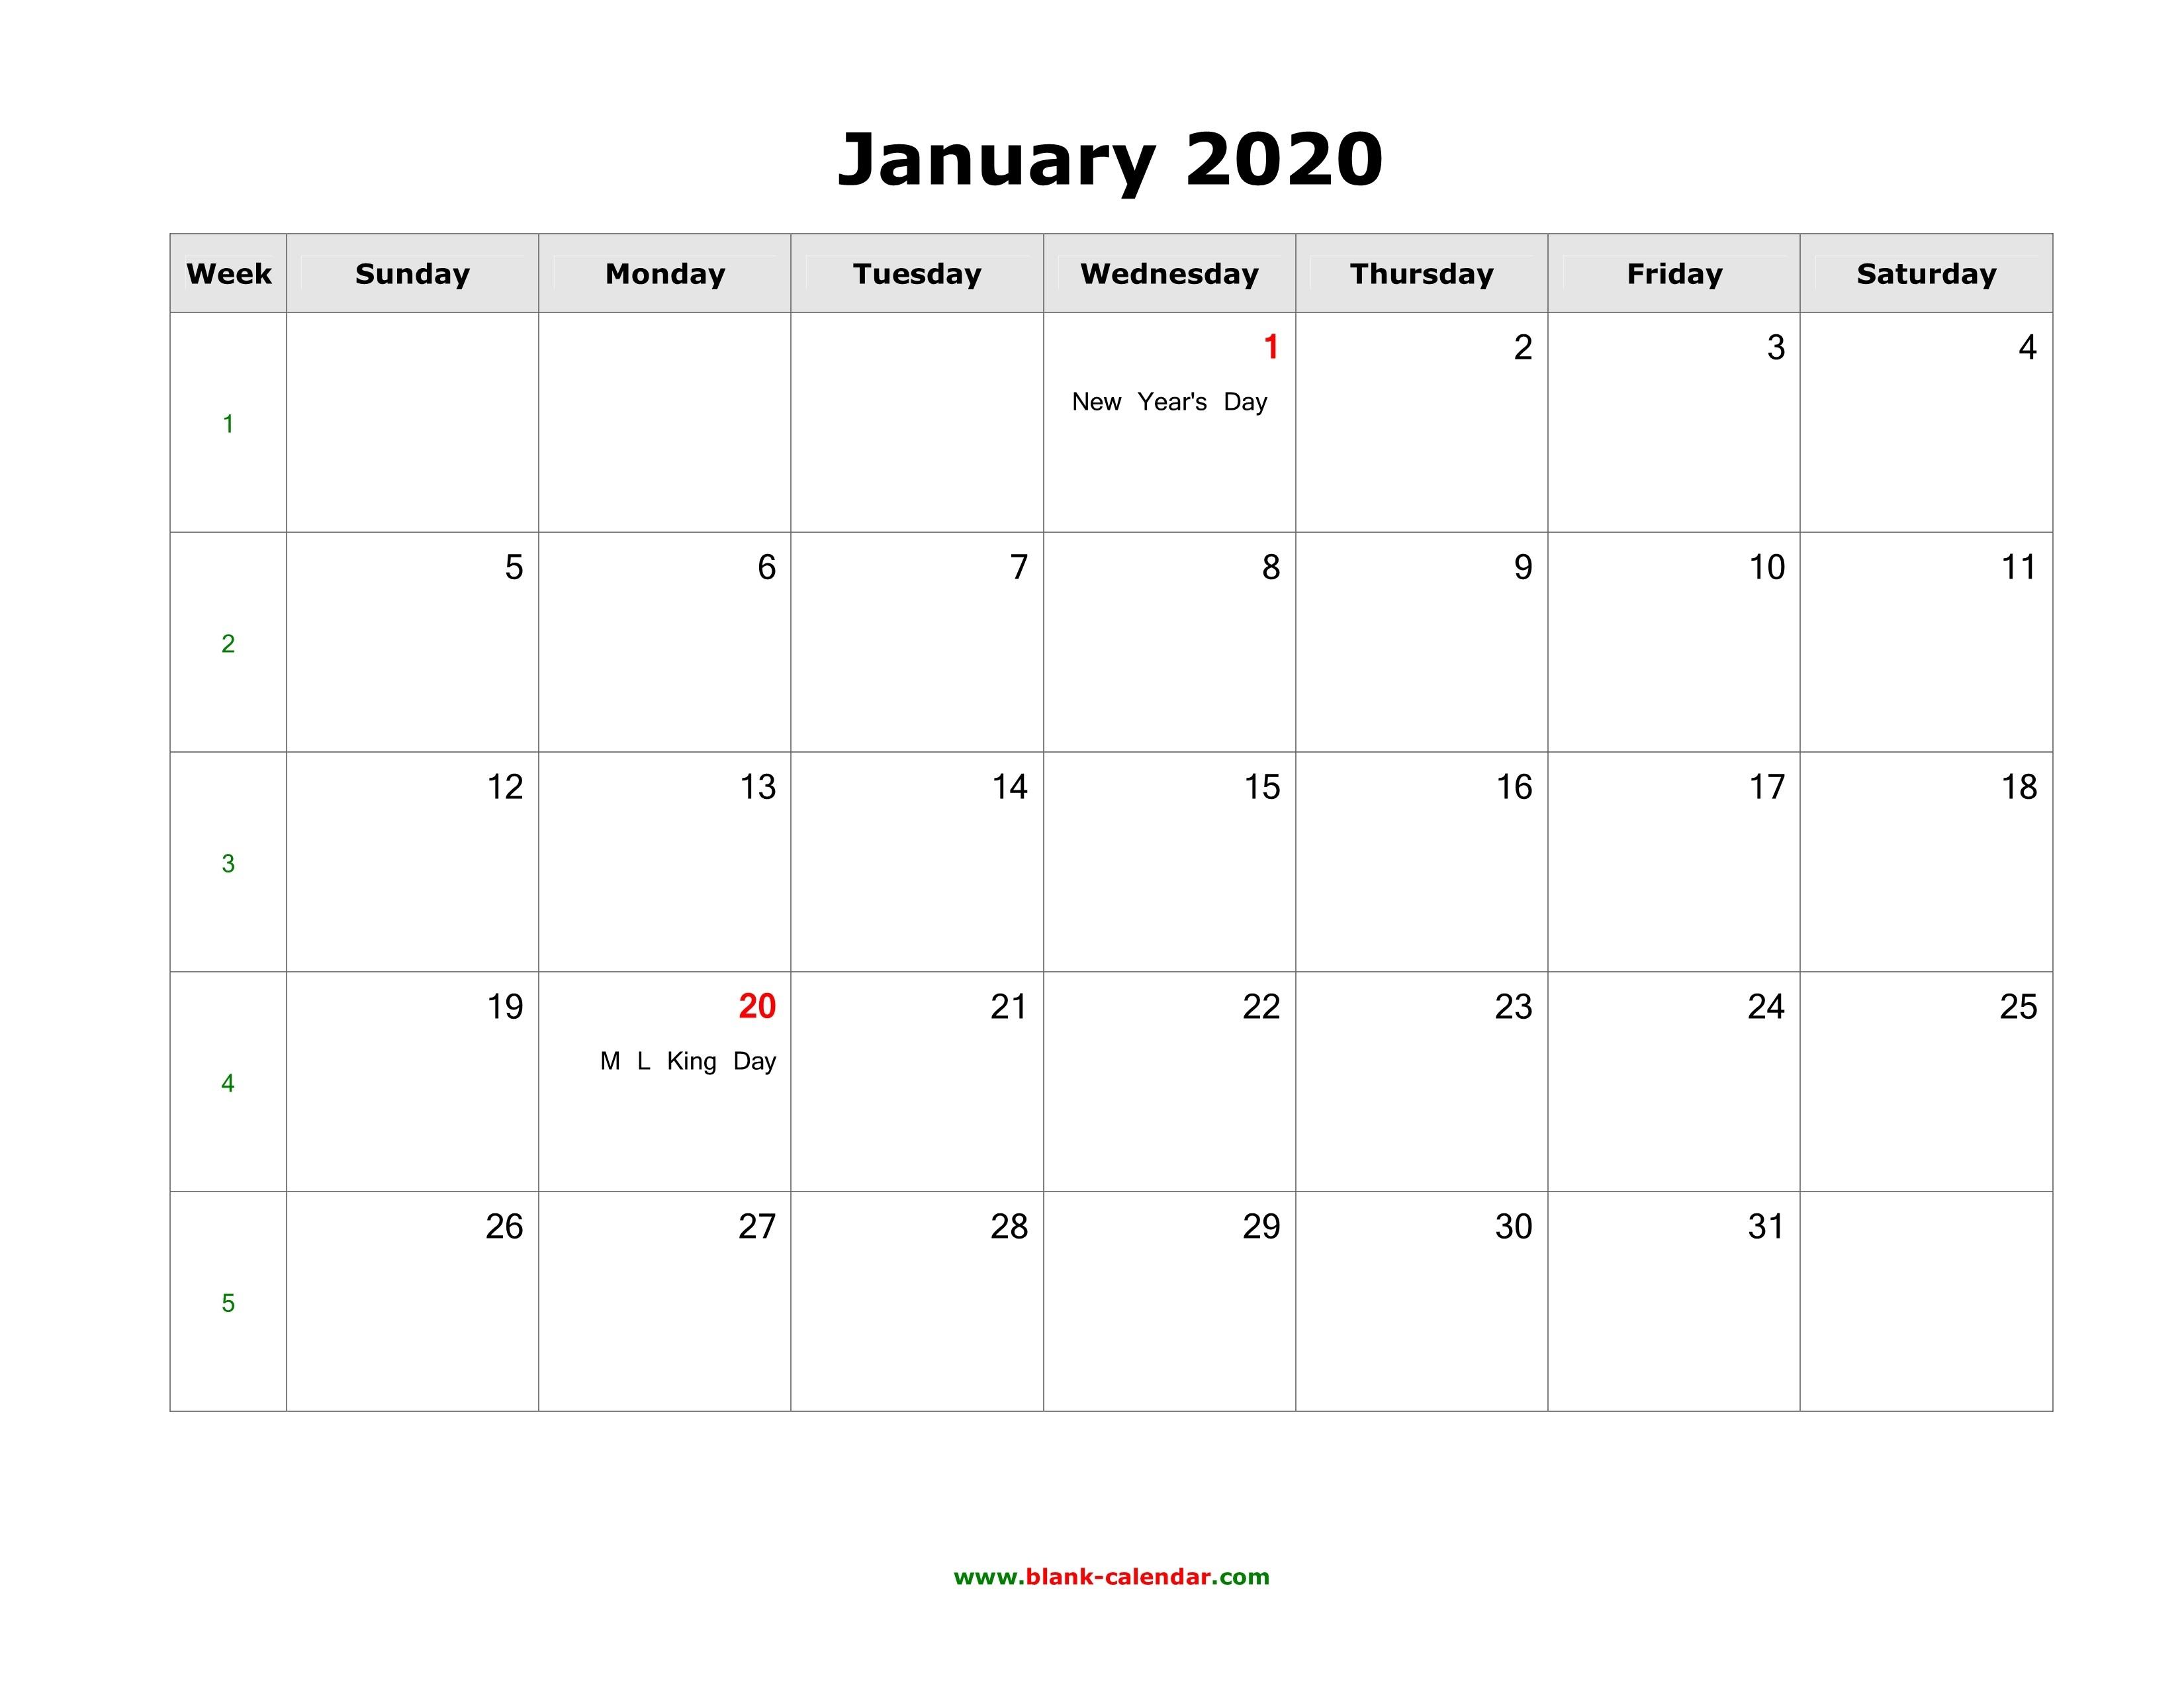 January 2020 Blank Calendar | Free Download Calendar Templates-January 2020 Calendar Word